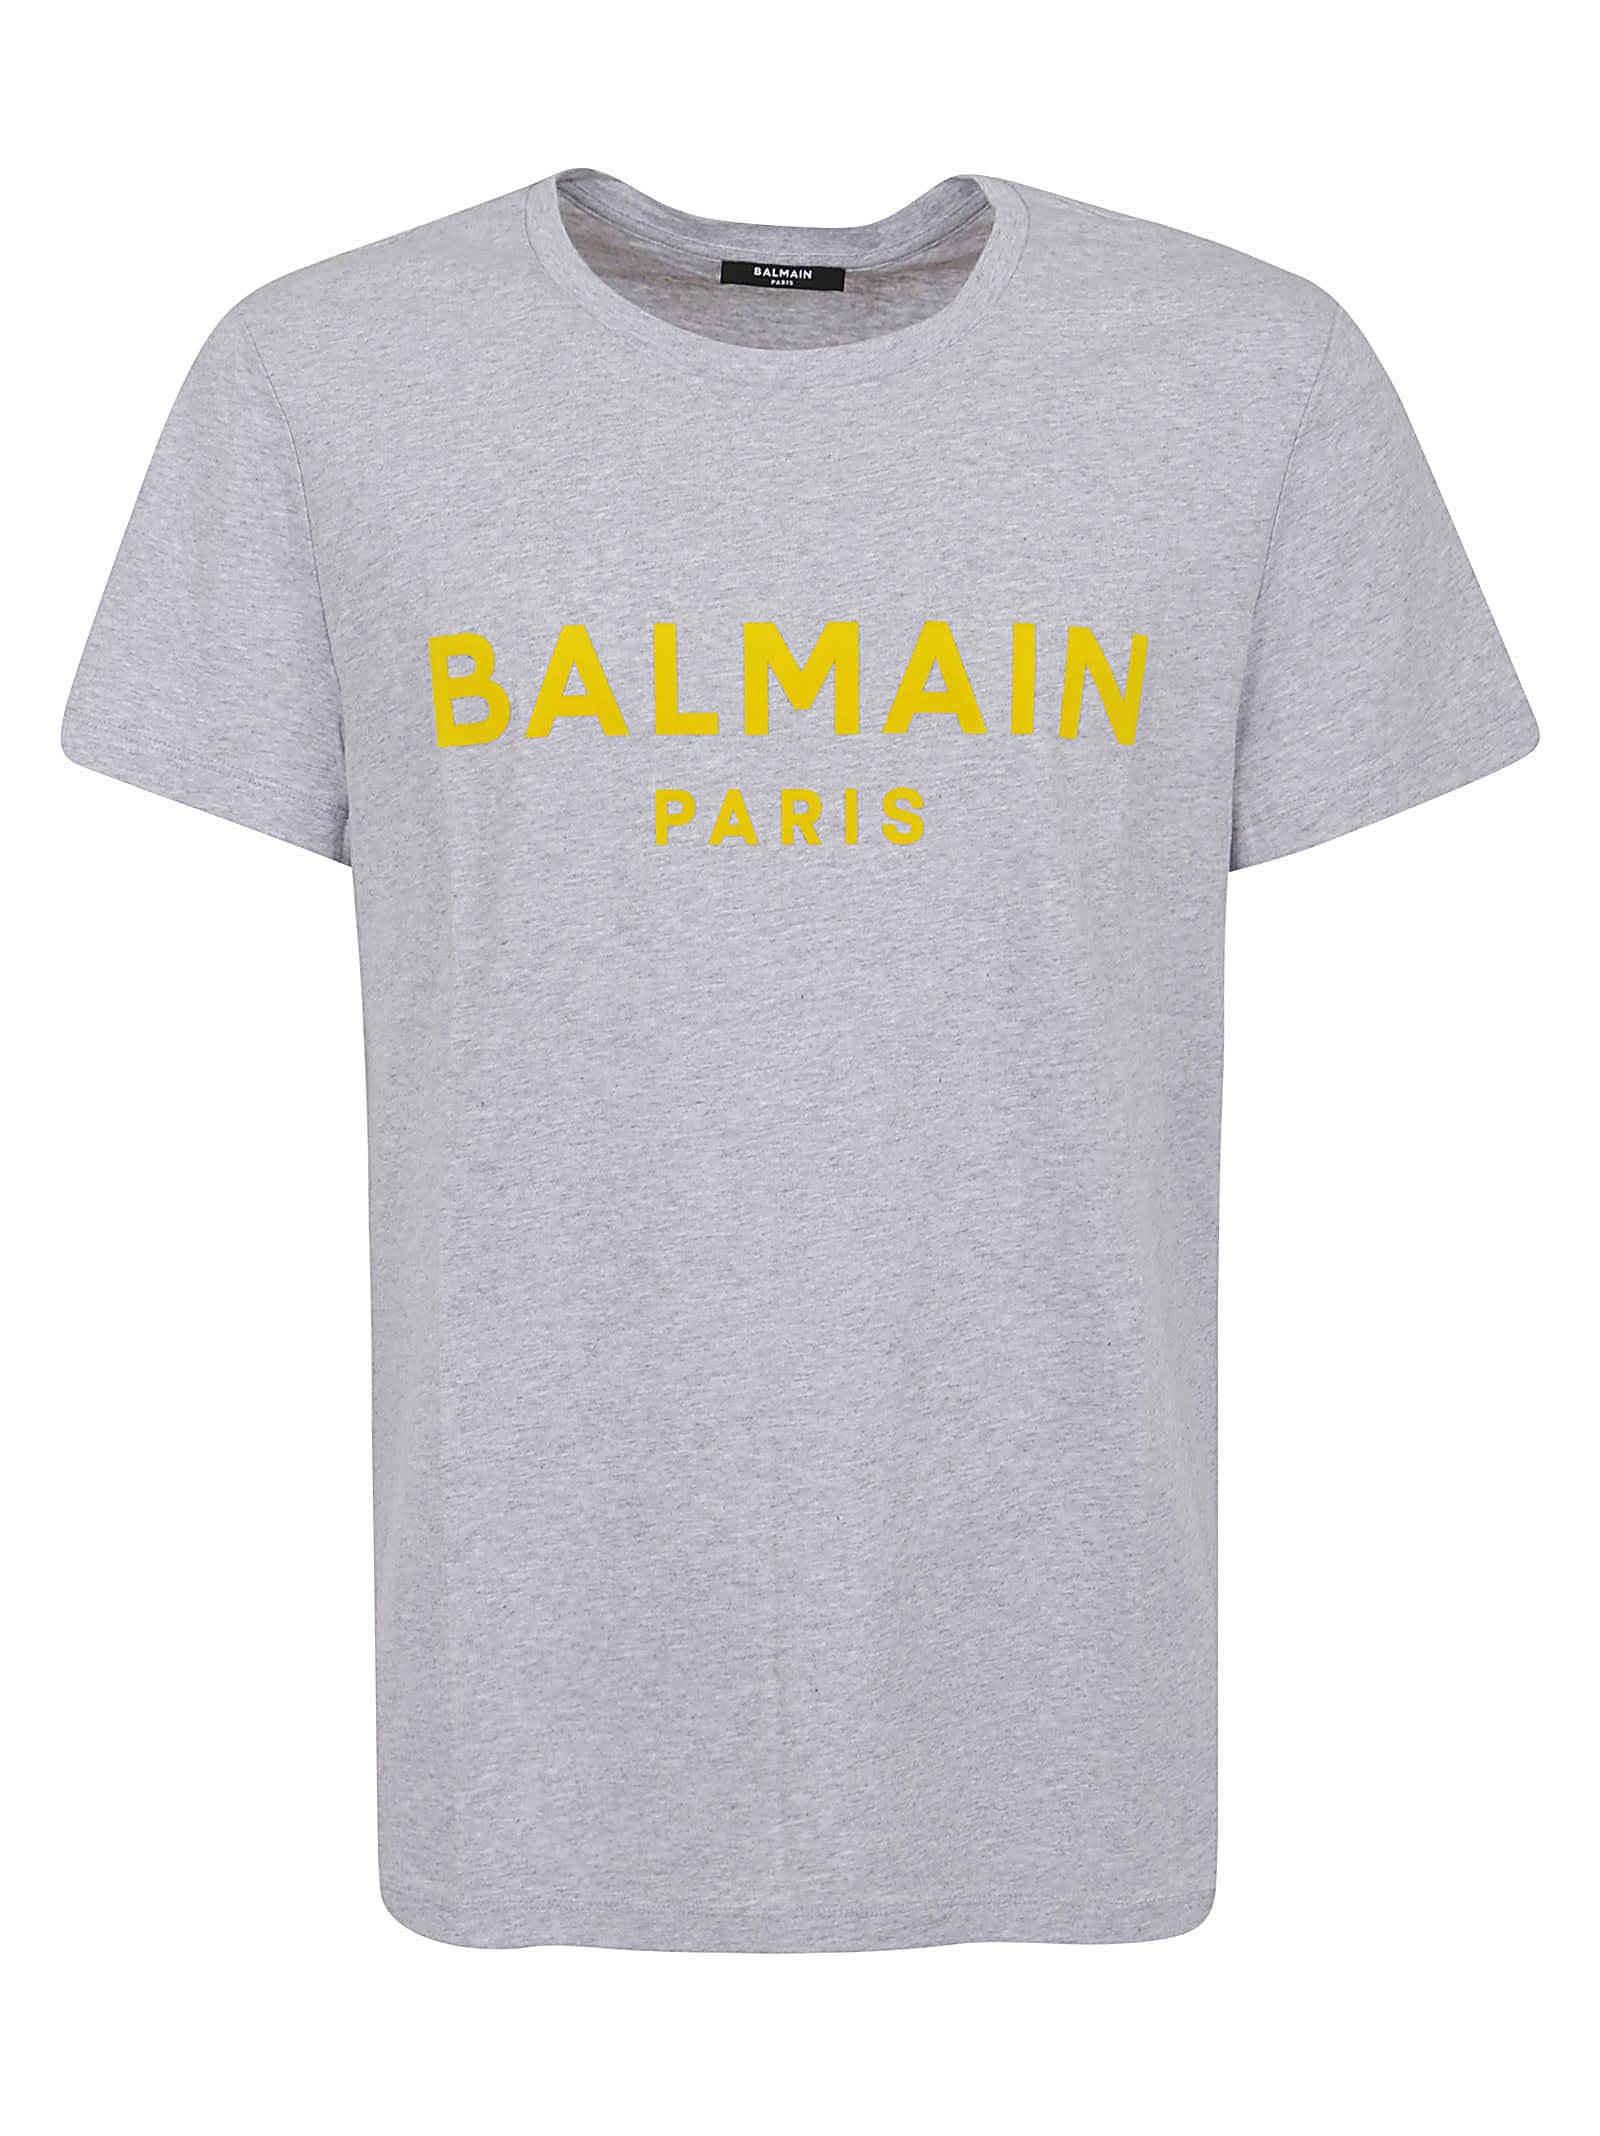 Balmain FLOCK T-SHIRT